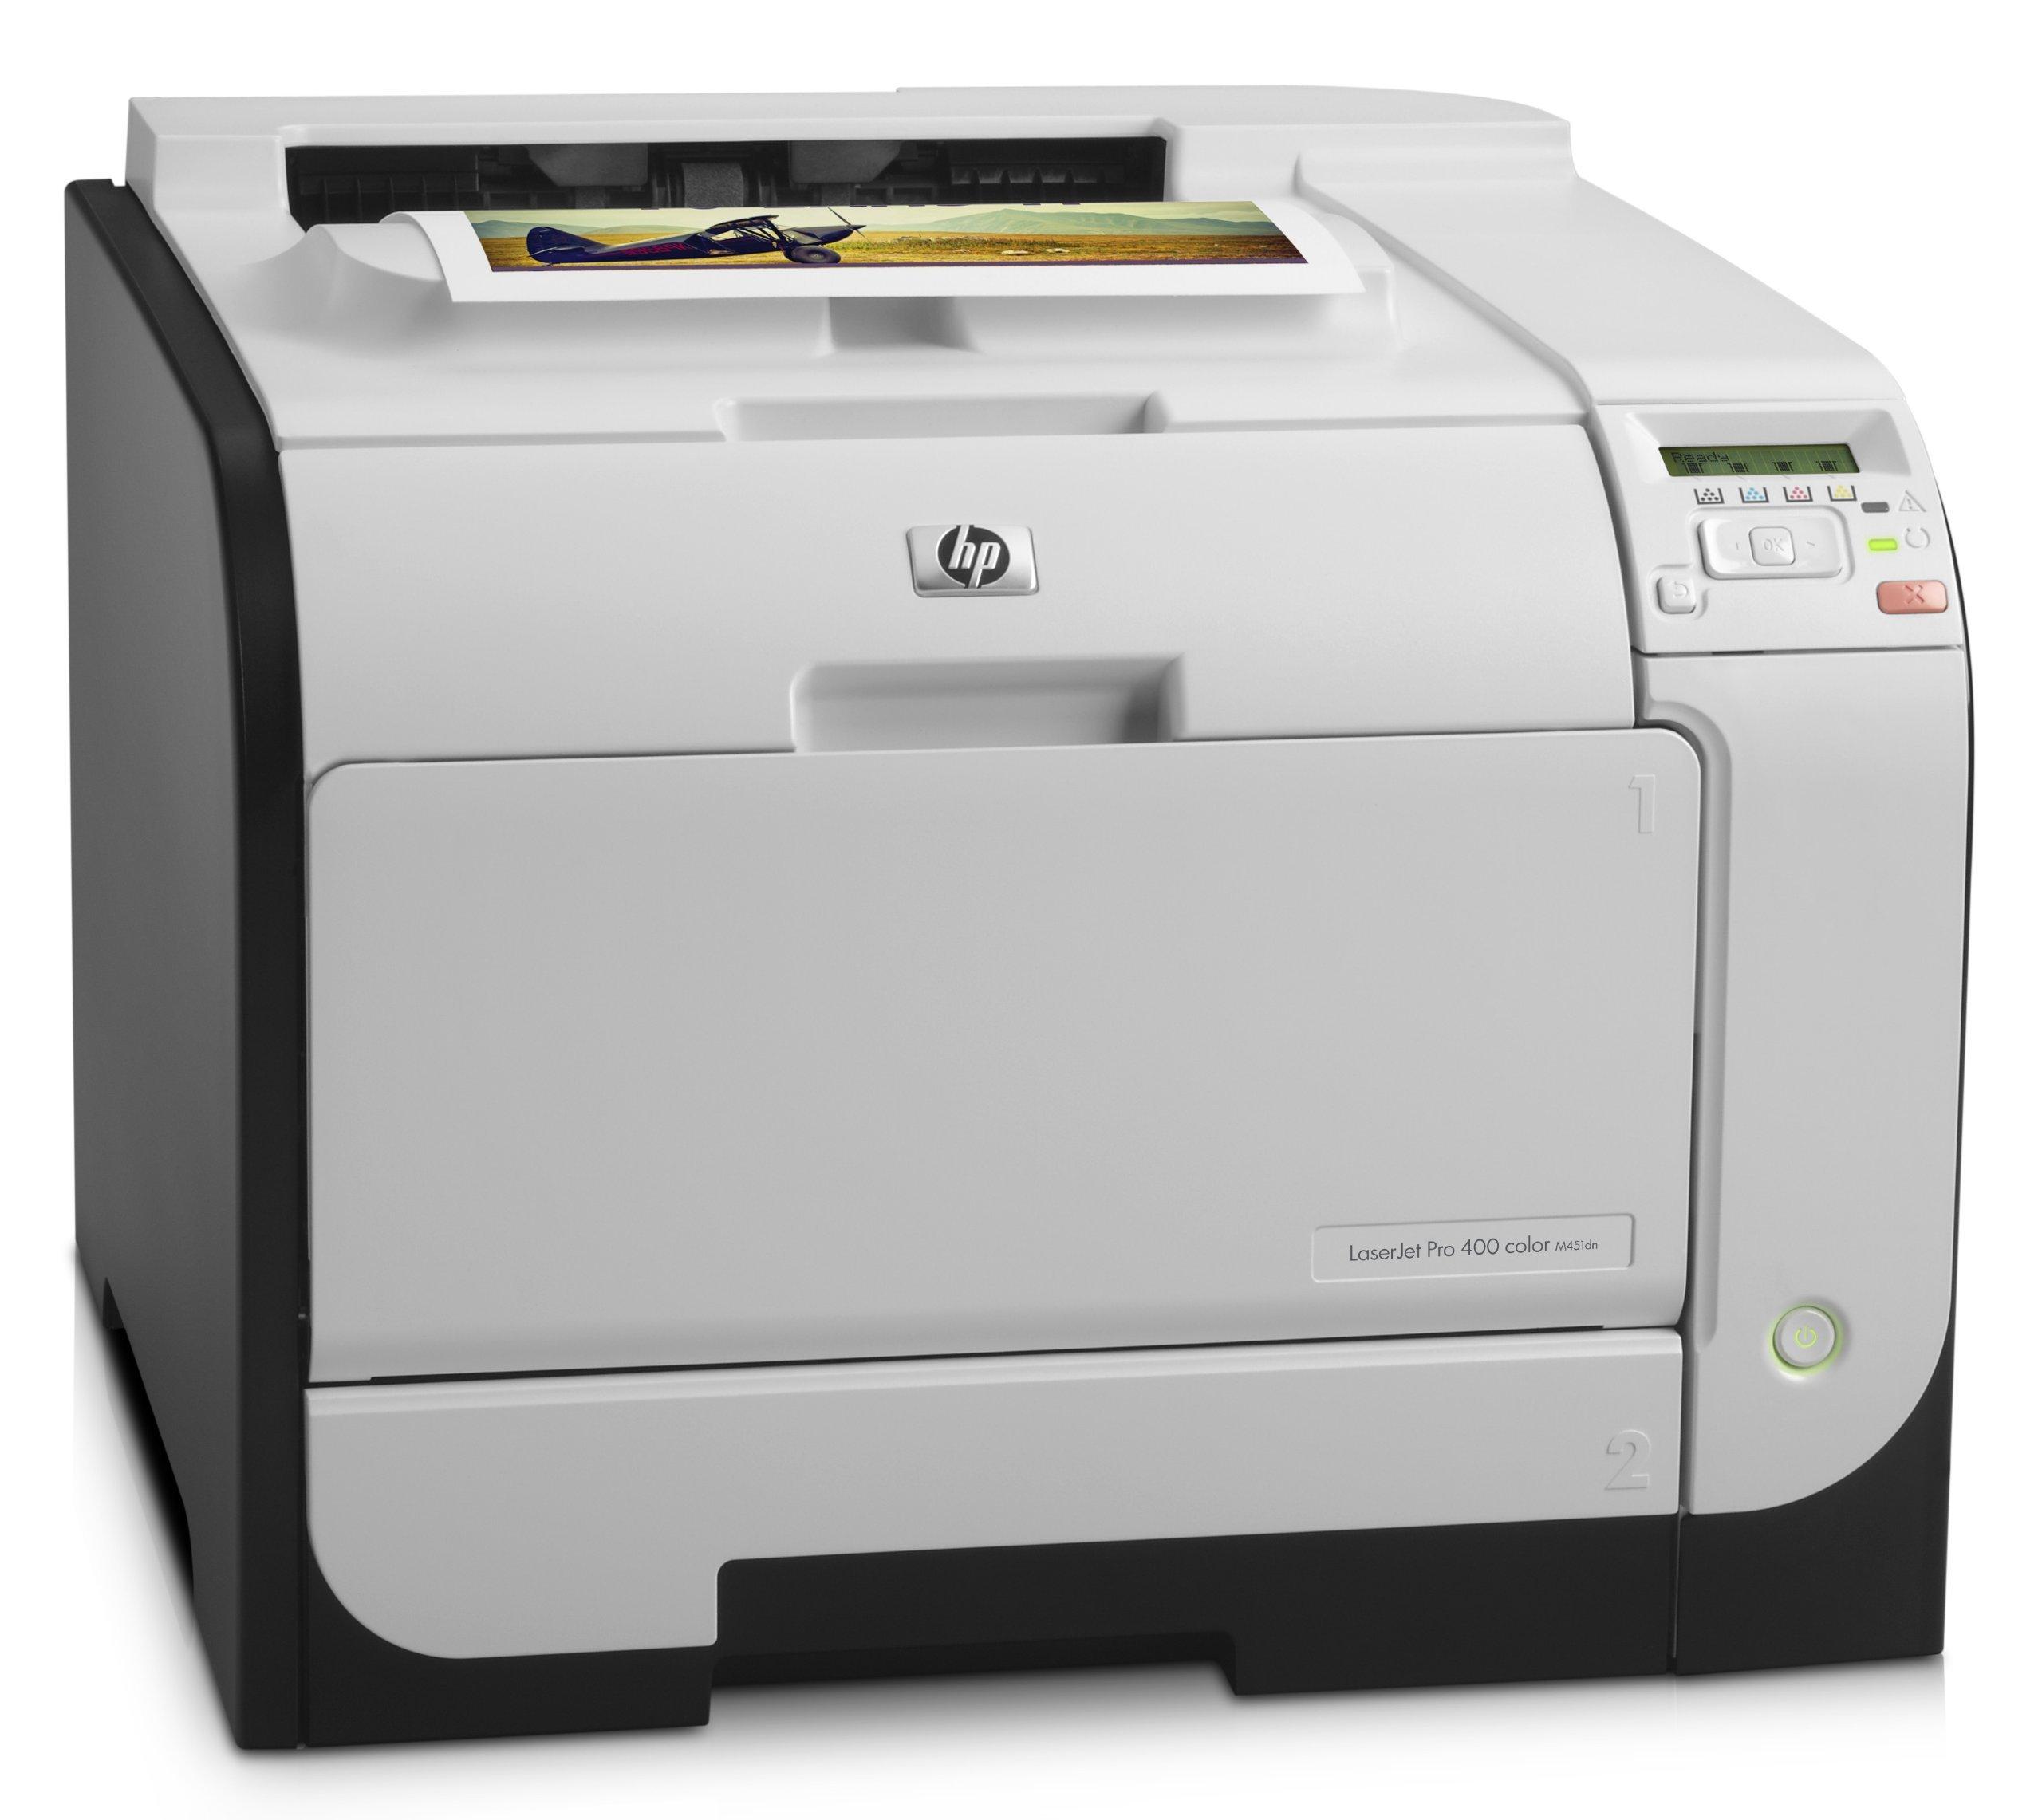 HP LaserJet Pro 400 m451dn Duplex Color Laser Printer (Renewed) by HP (Image #2)